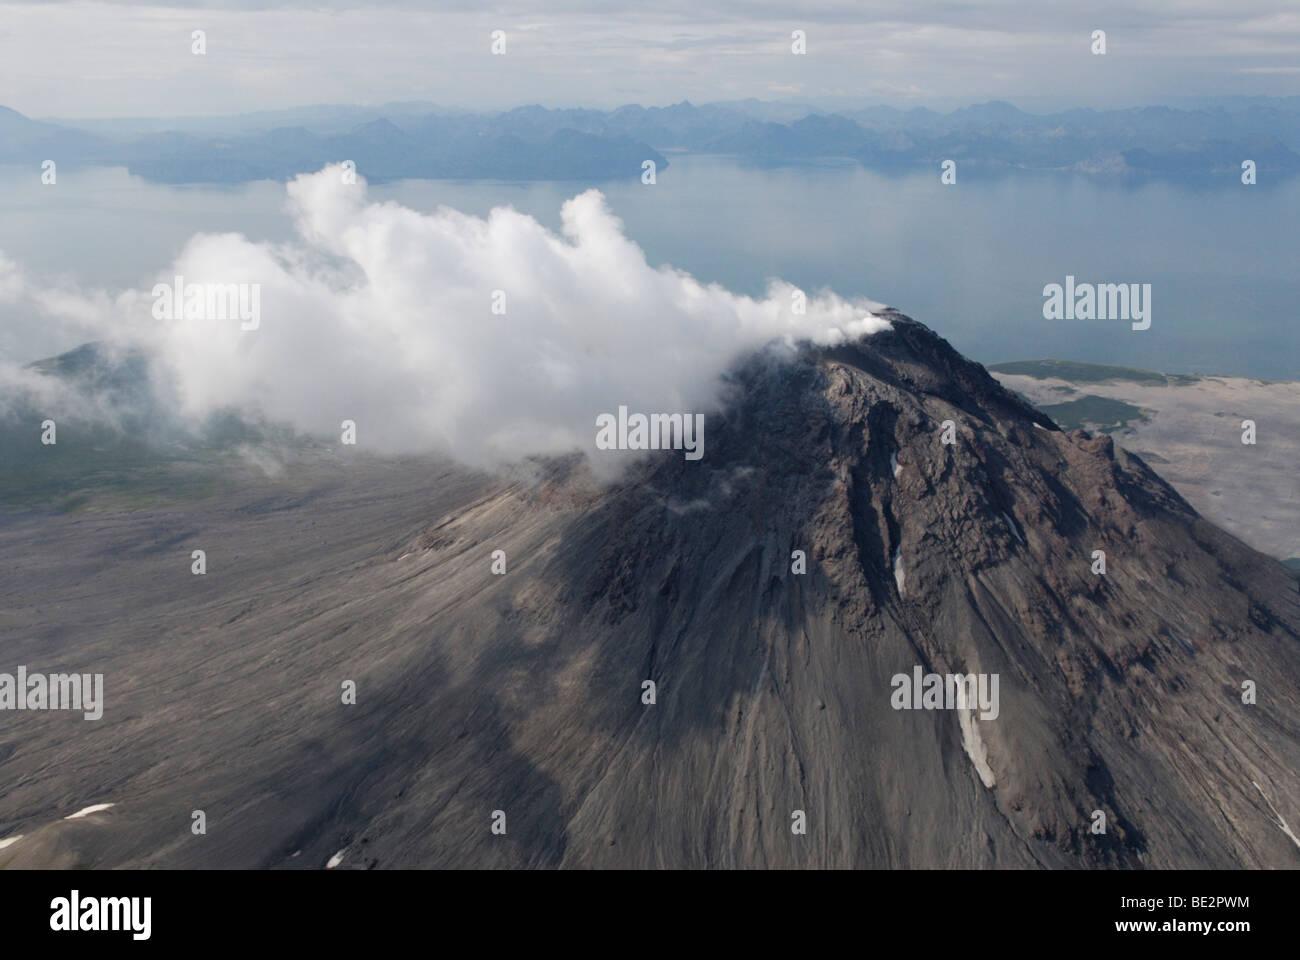 Augustine Volcano, Cook Inlet, Alaska - Stock Image